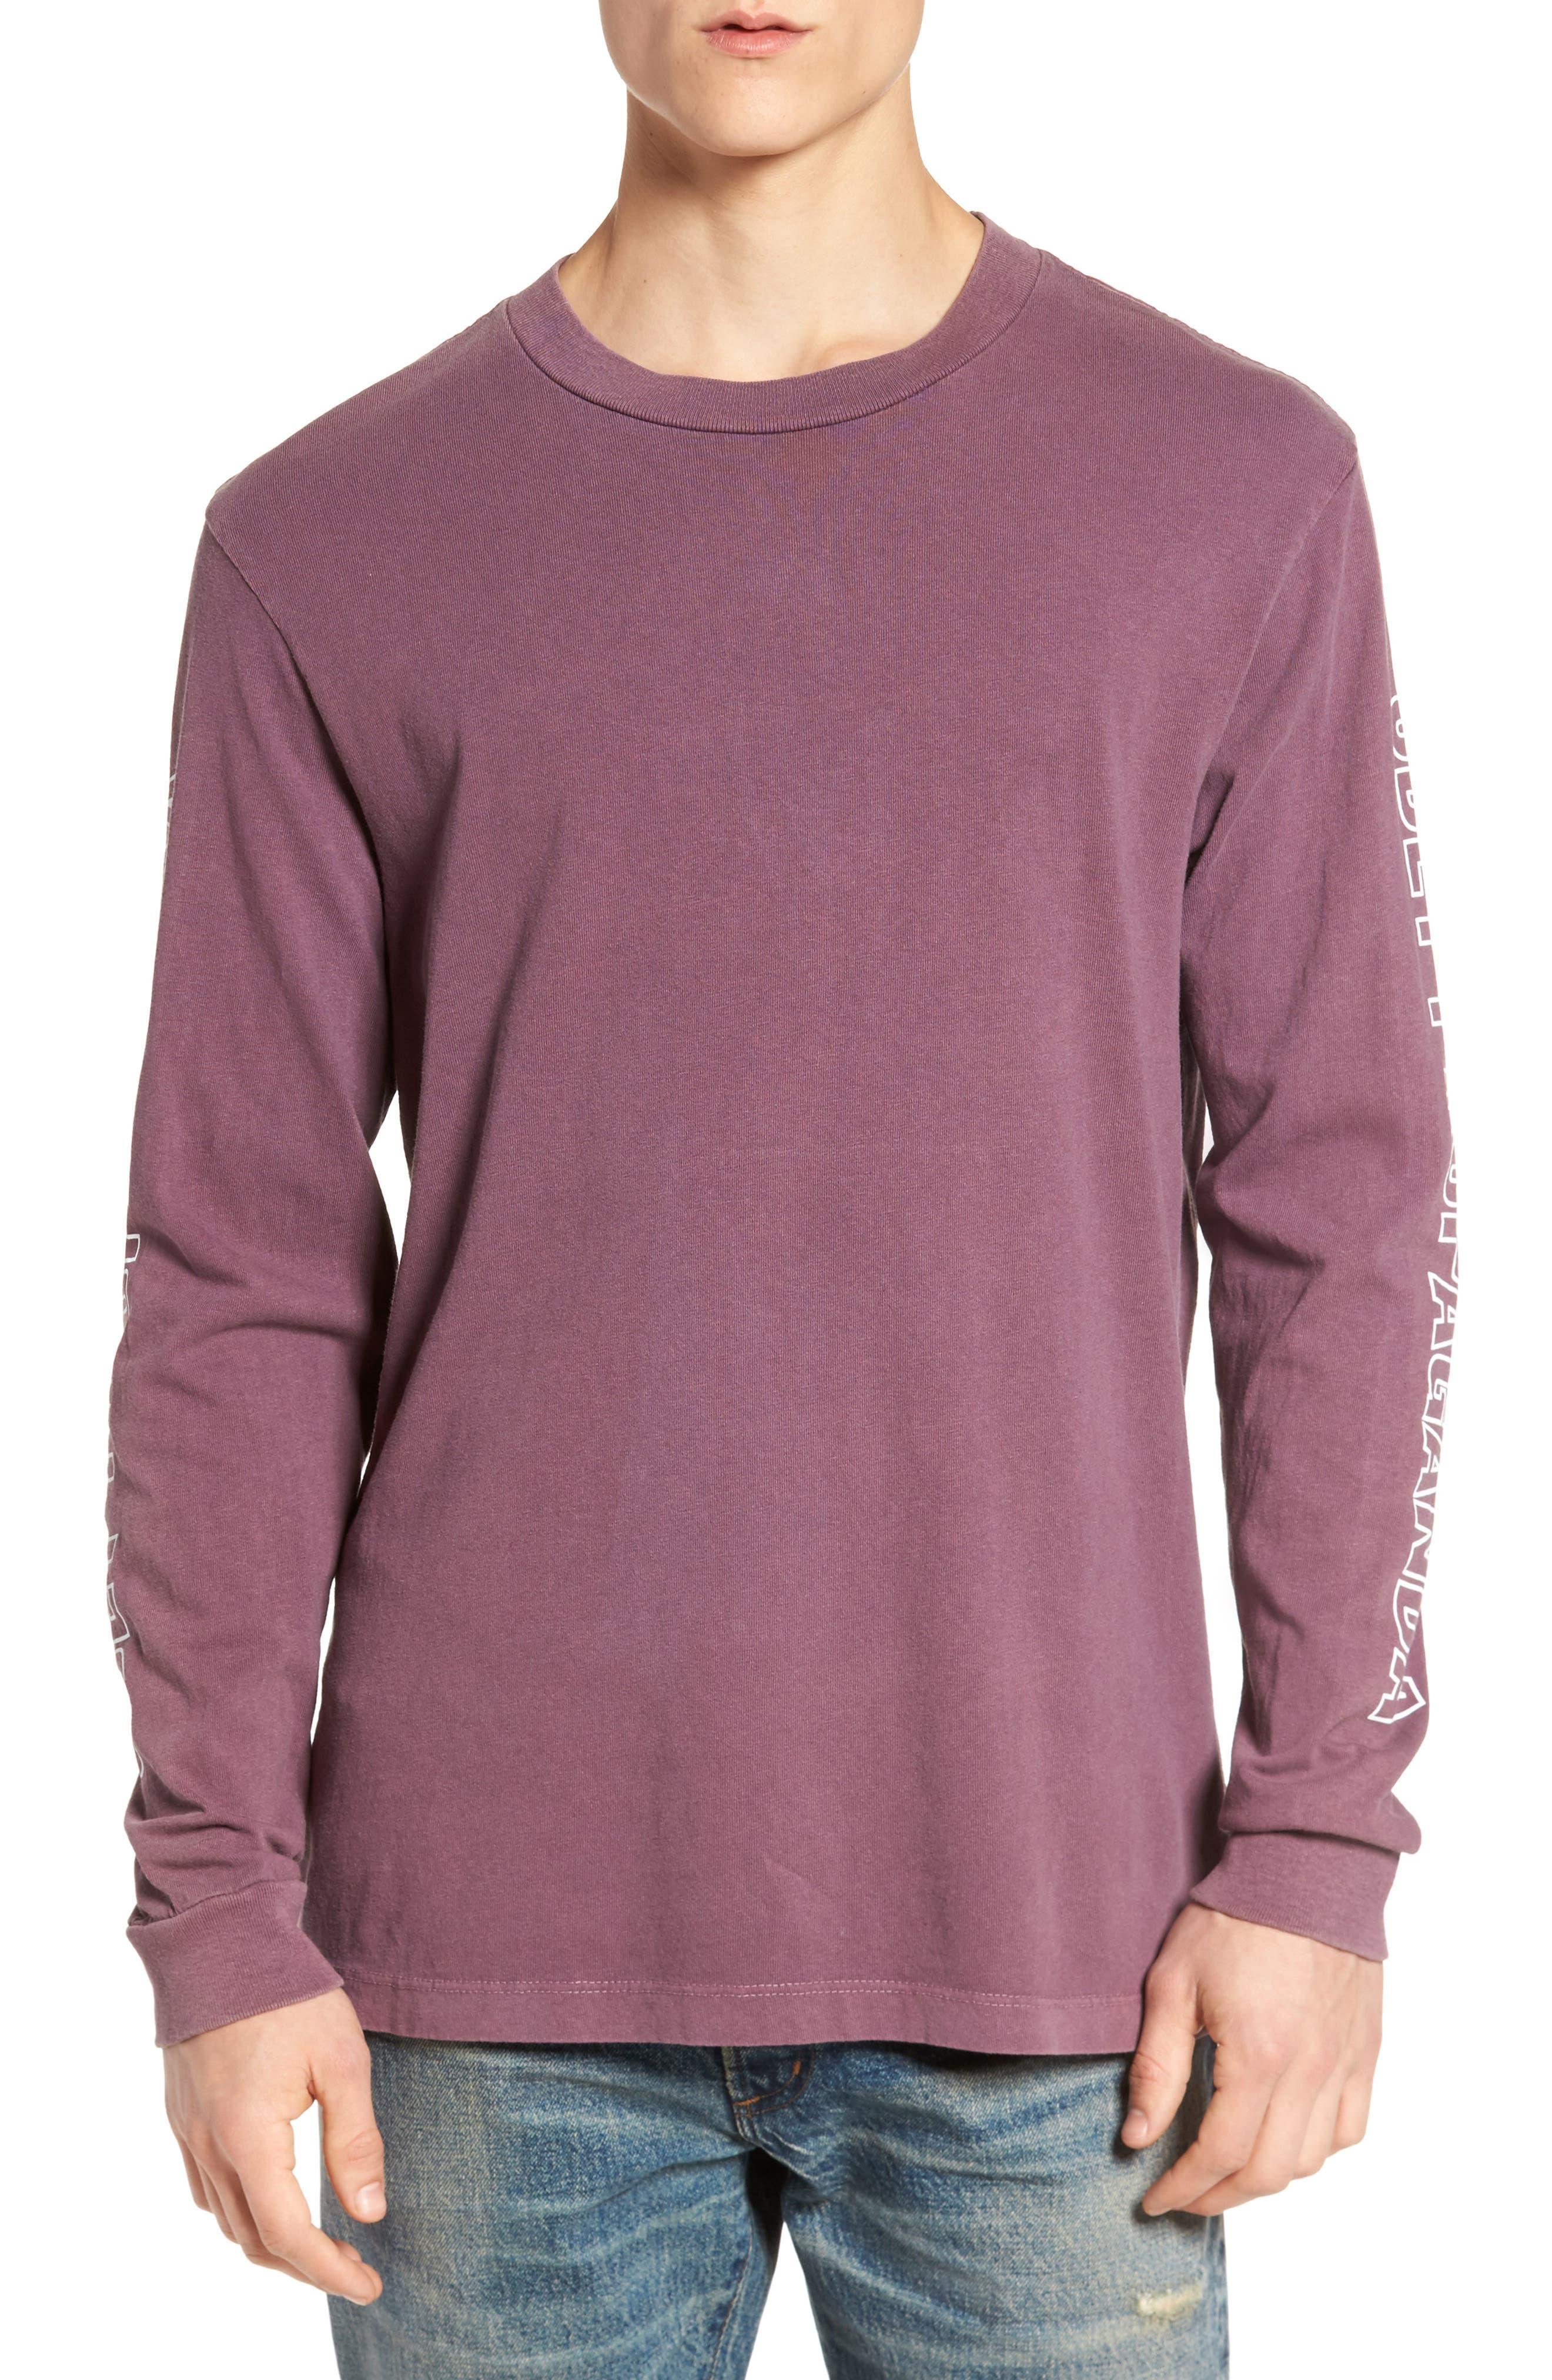 Rough Draft Long Sleeve T-Shirt,                             Main thumbnail 1, color,                             503